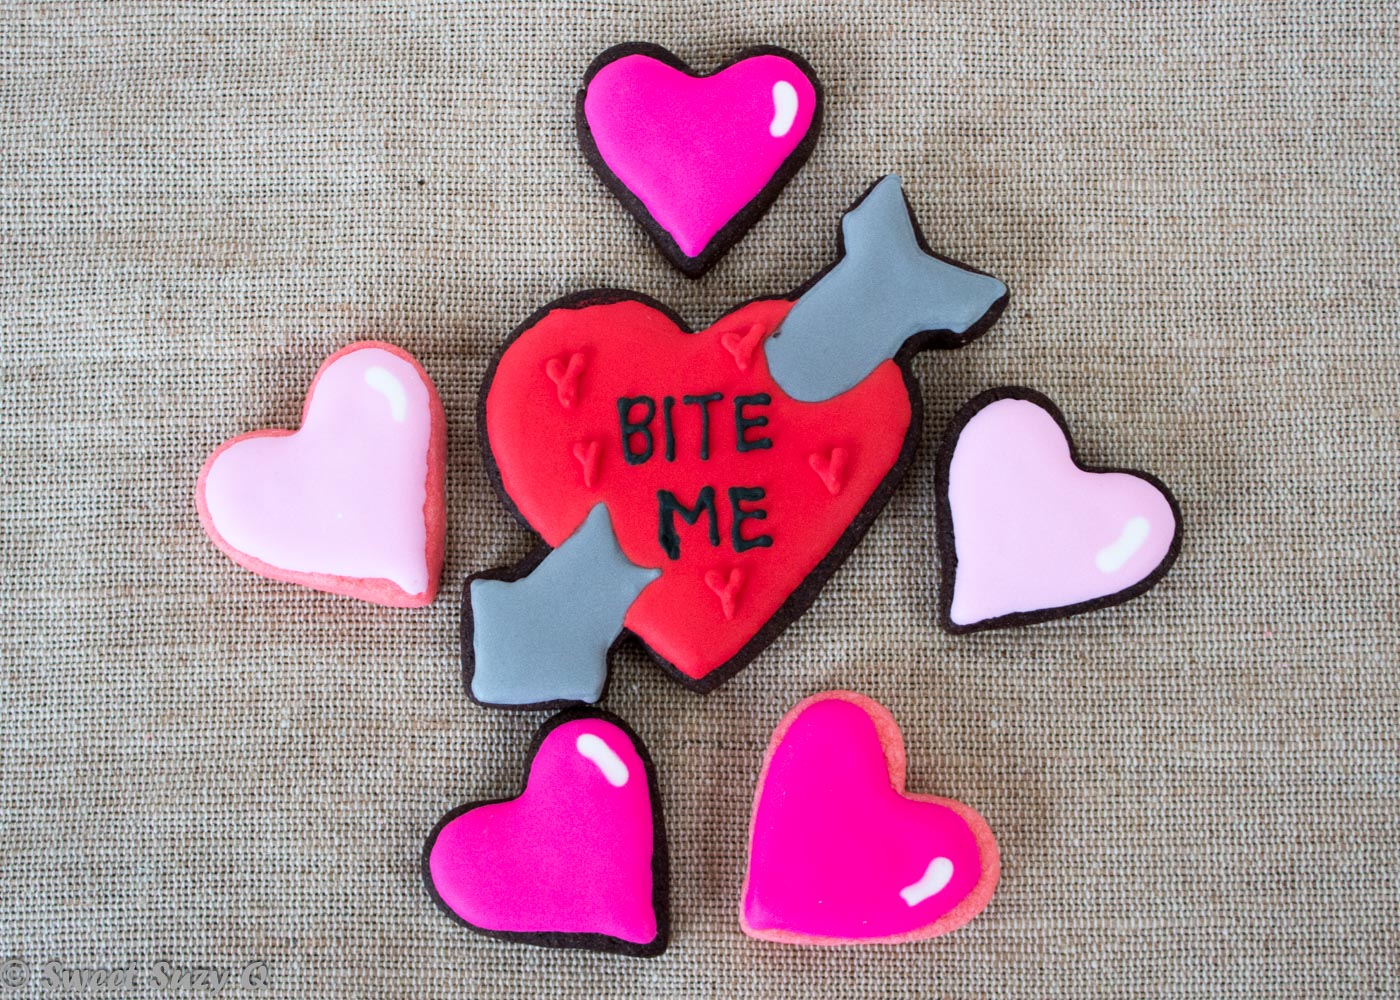 Anti Valentine's Day cookies